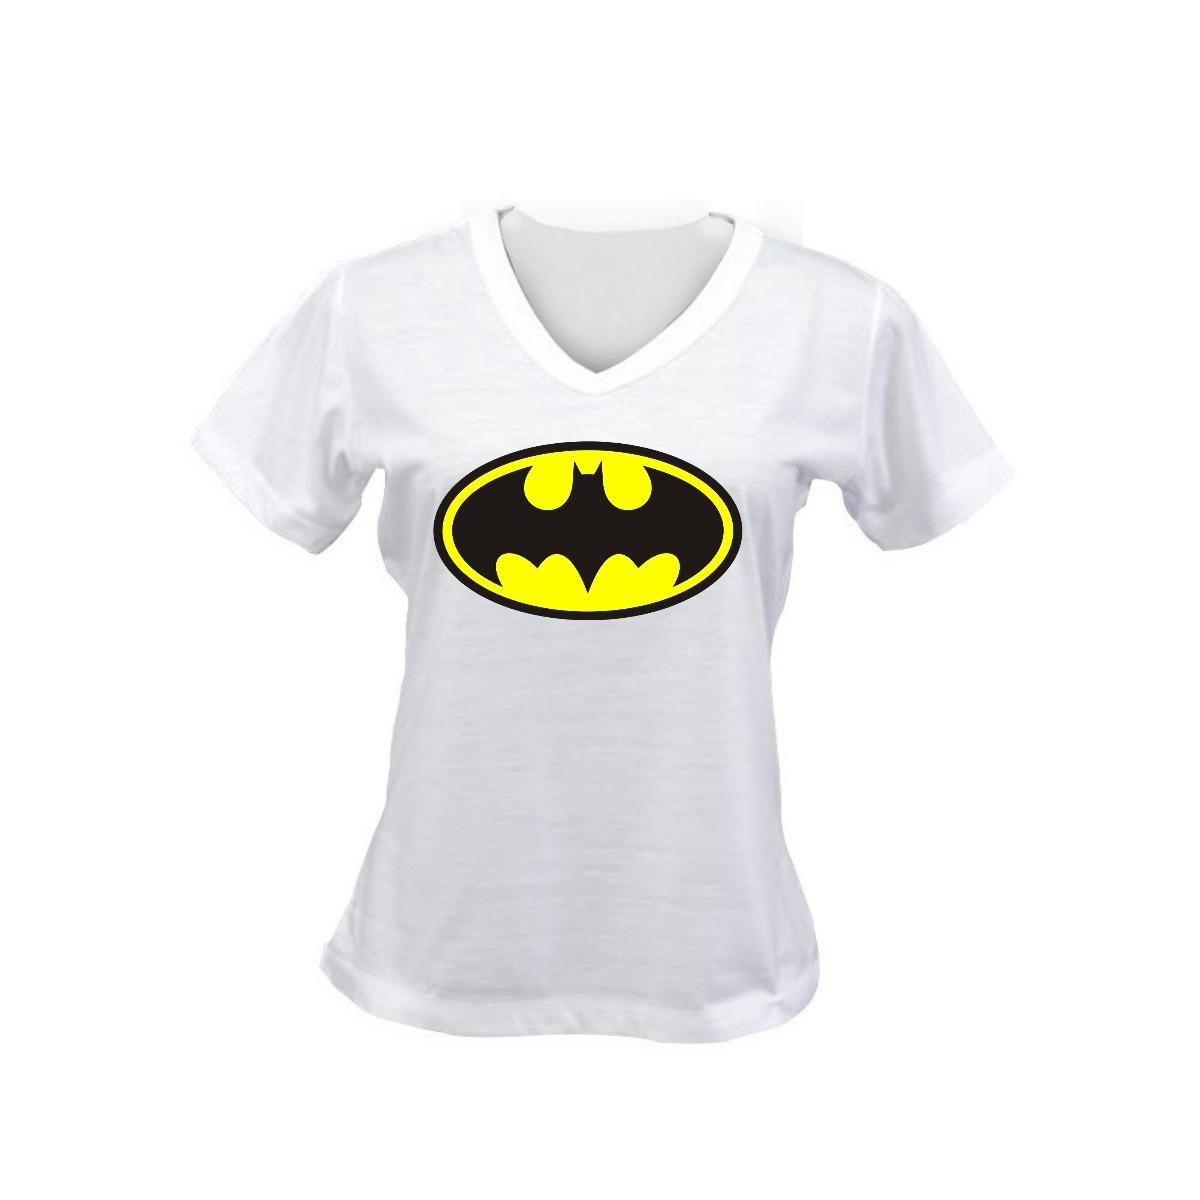 Camiseta Baby Look Feminina Escudo Batman Desenho Simbolo R 19